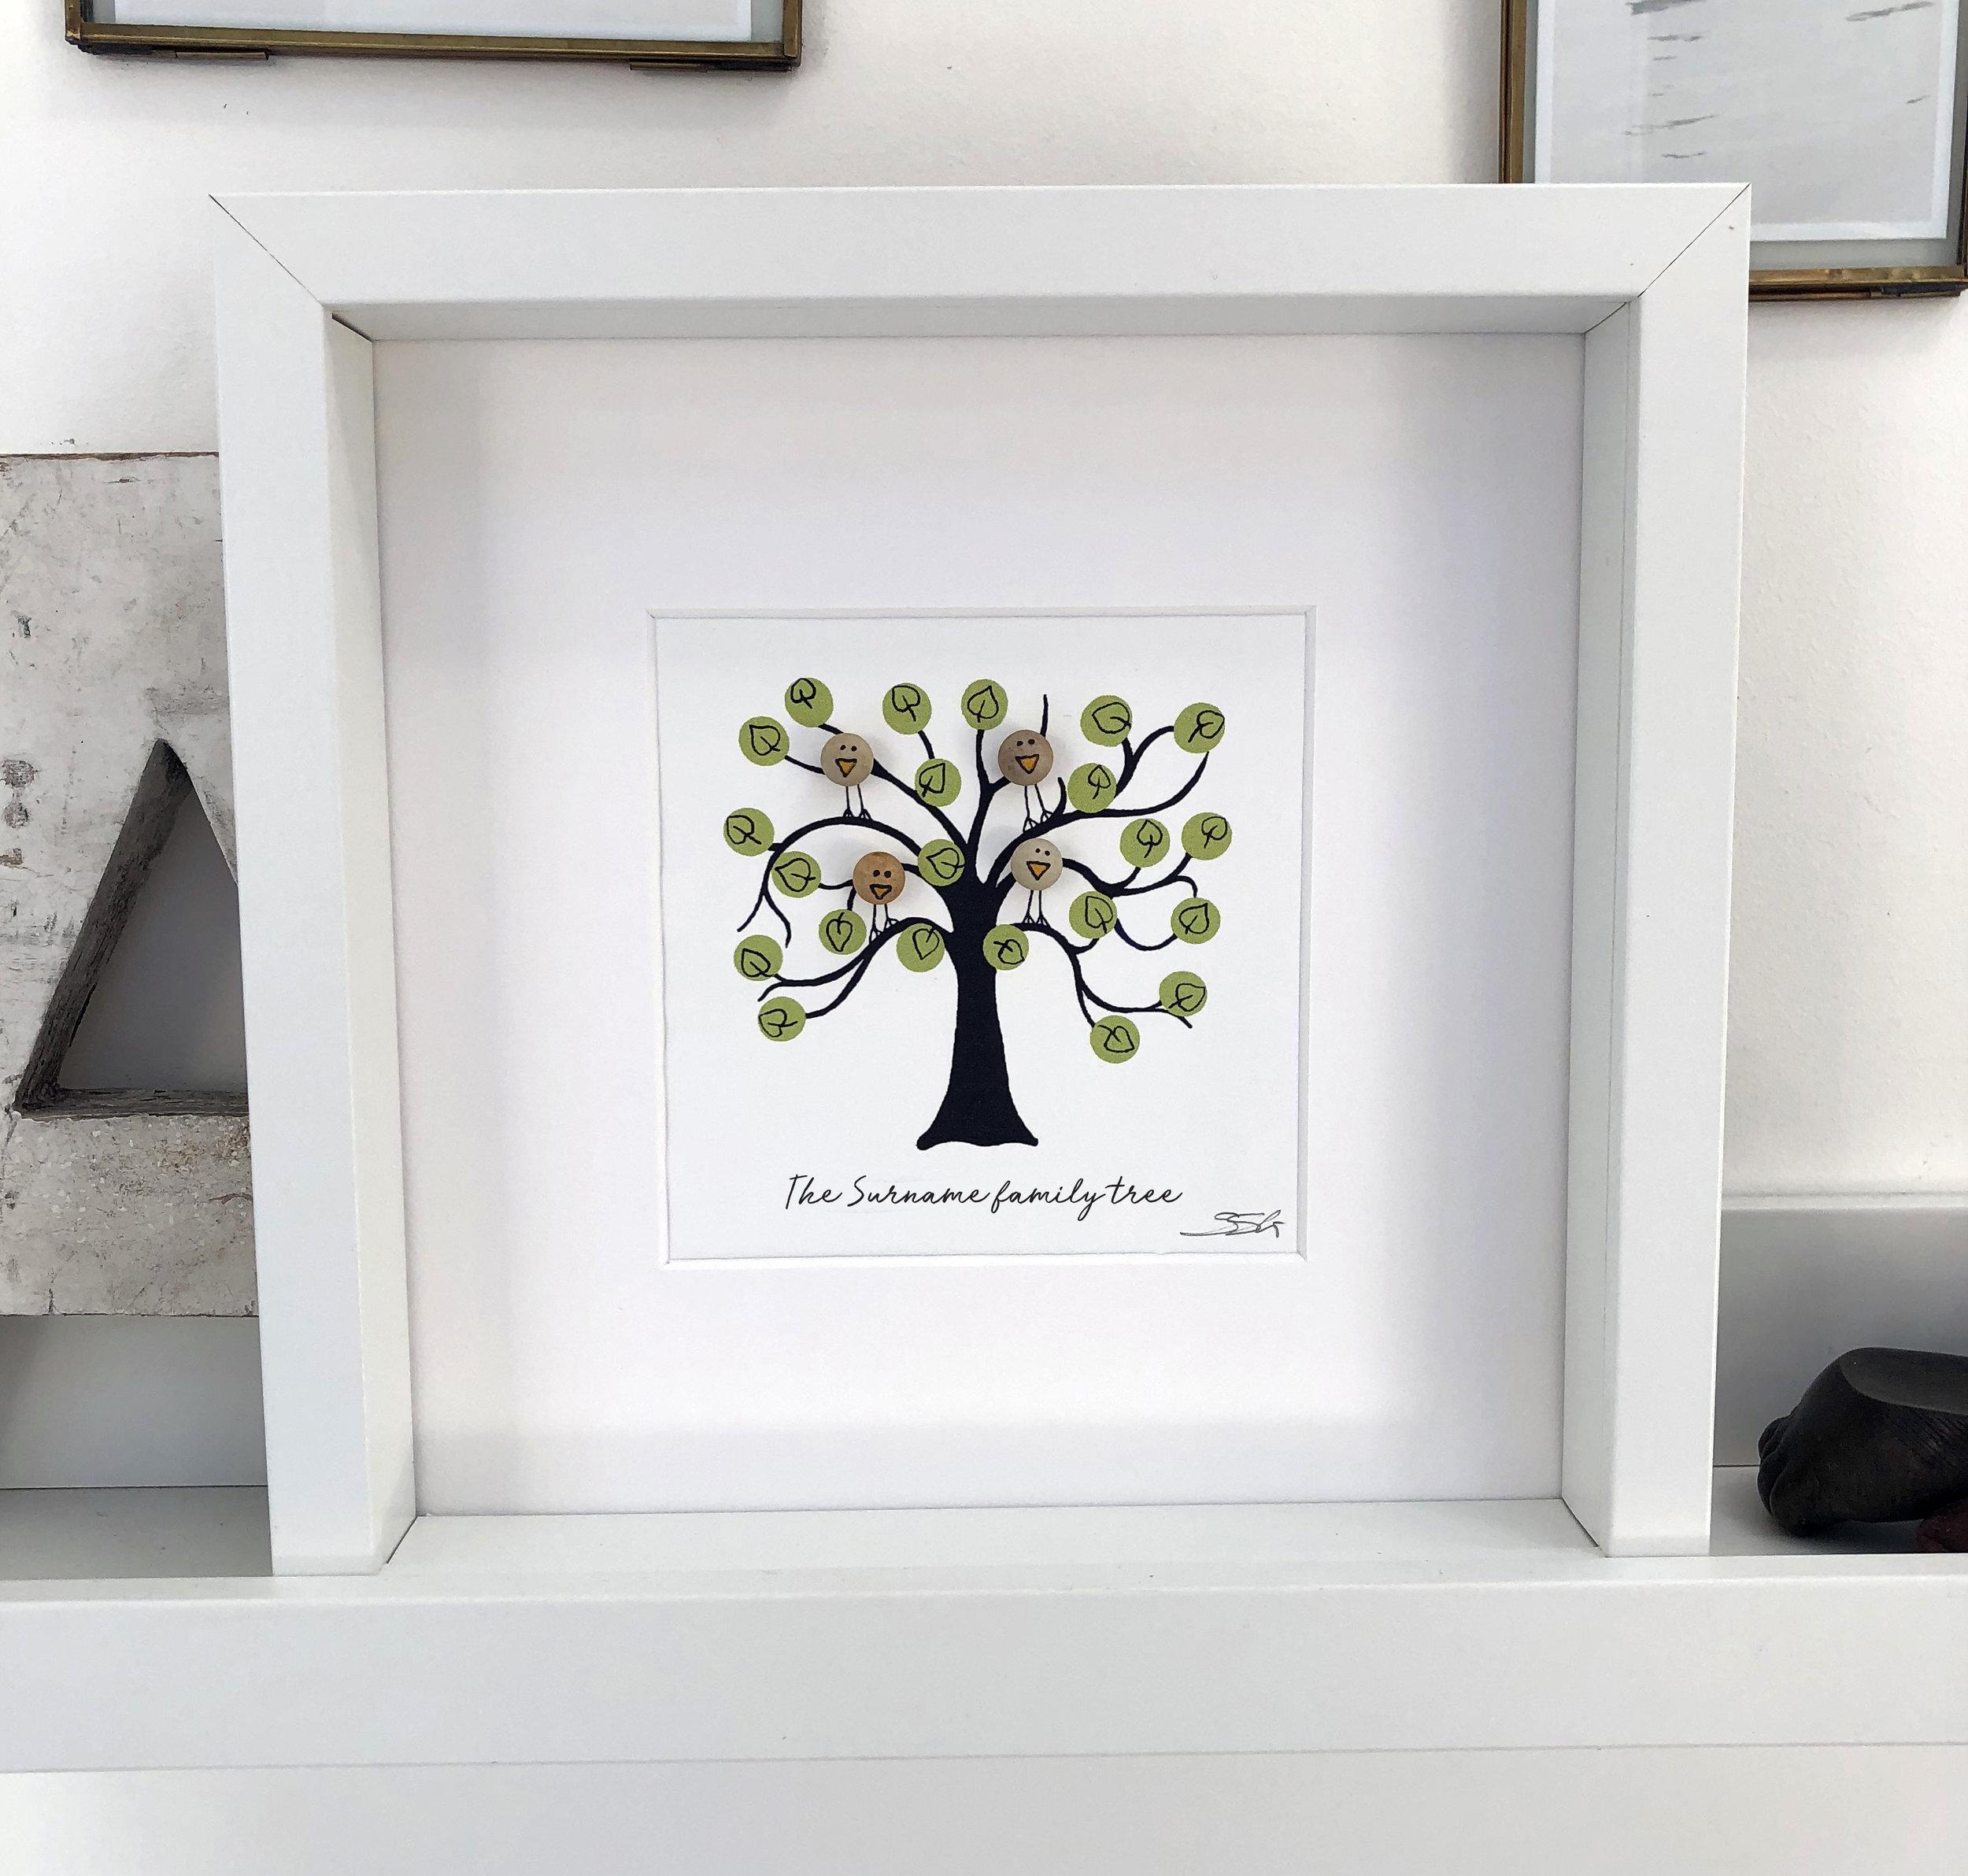 family tree_1 personal.jpg